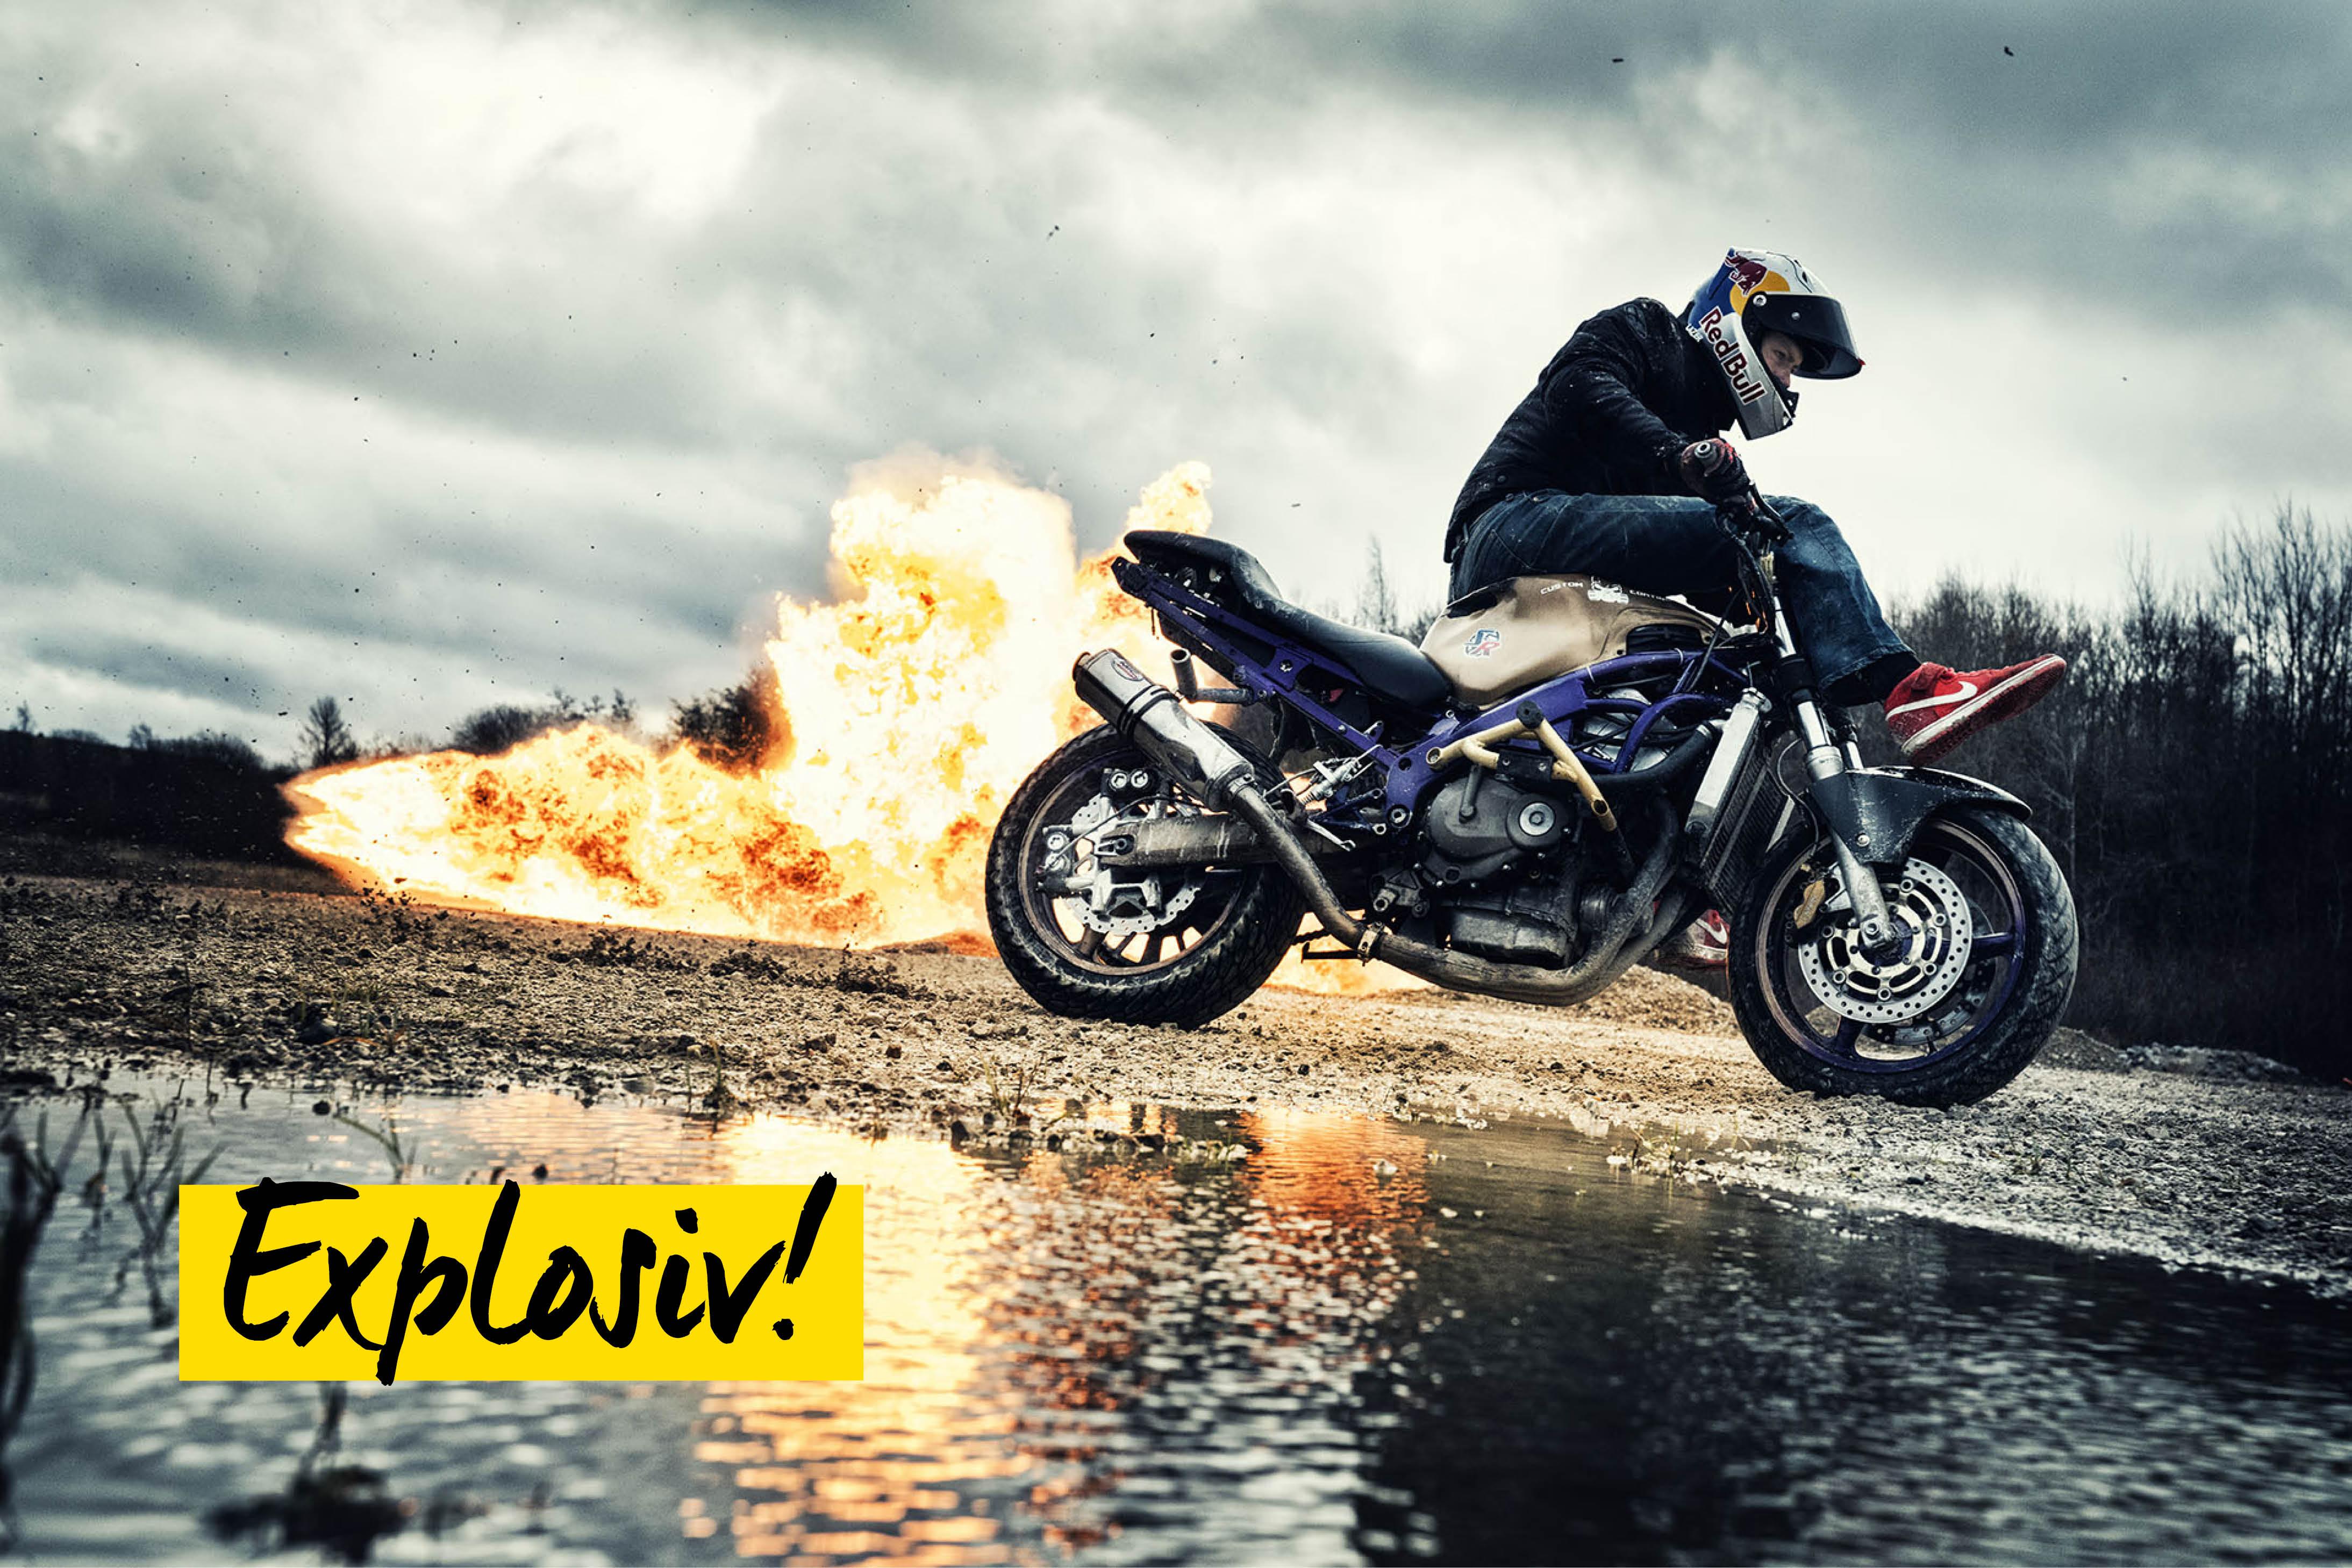 Mann mit brennendem Motorrad